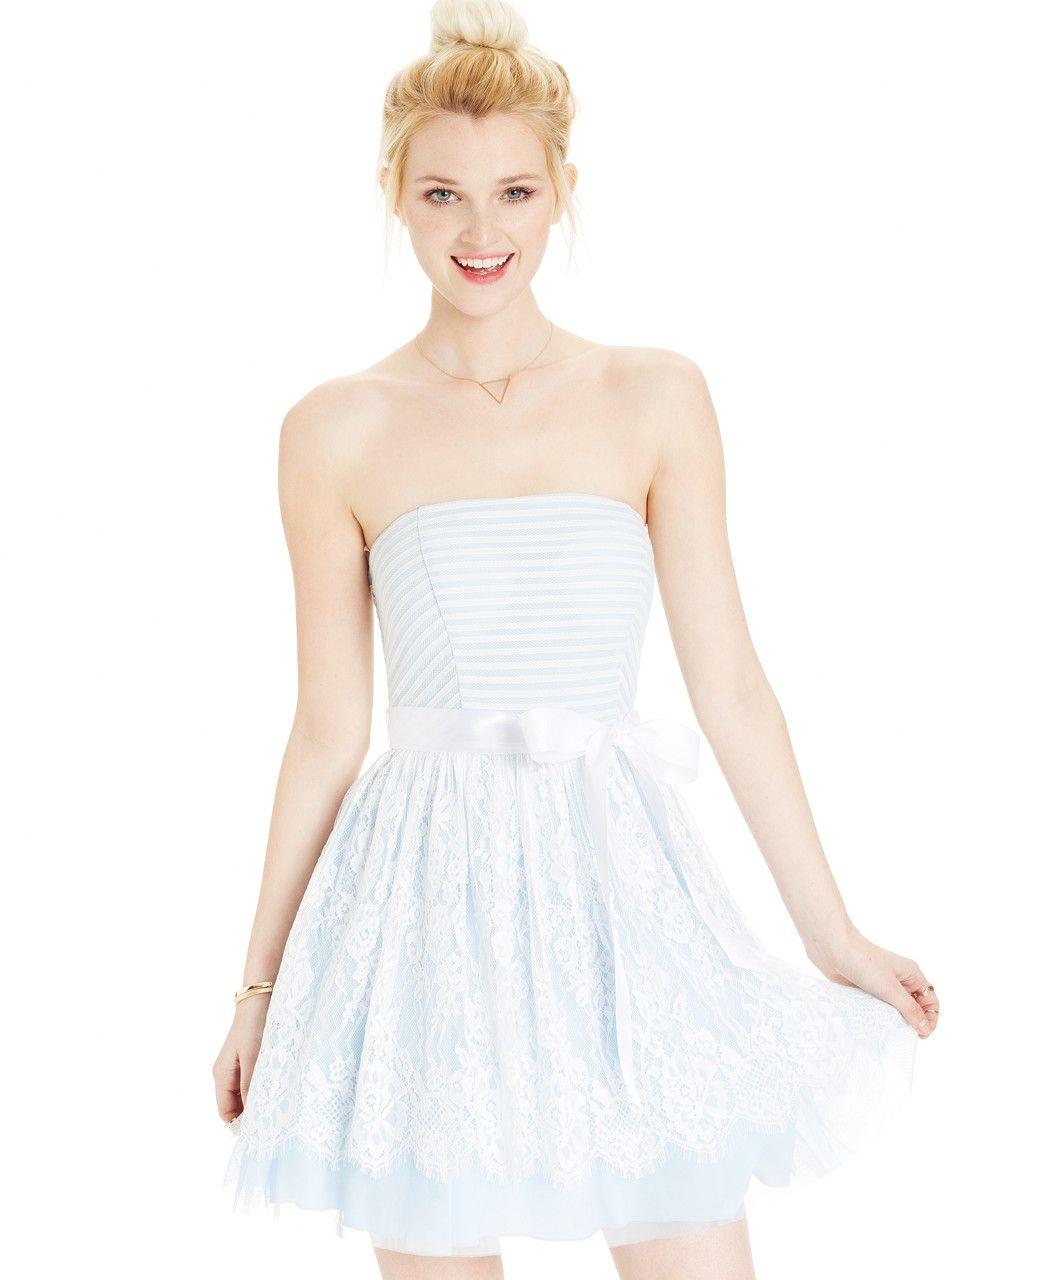 d05e6c9fd46 Short Cocktail Dresses Macys - Gomes Weine AG